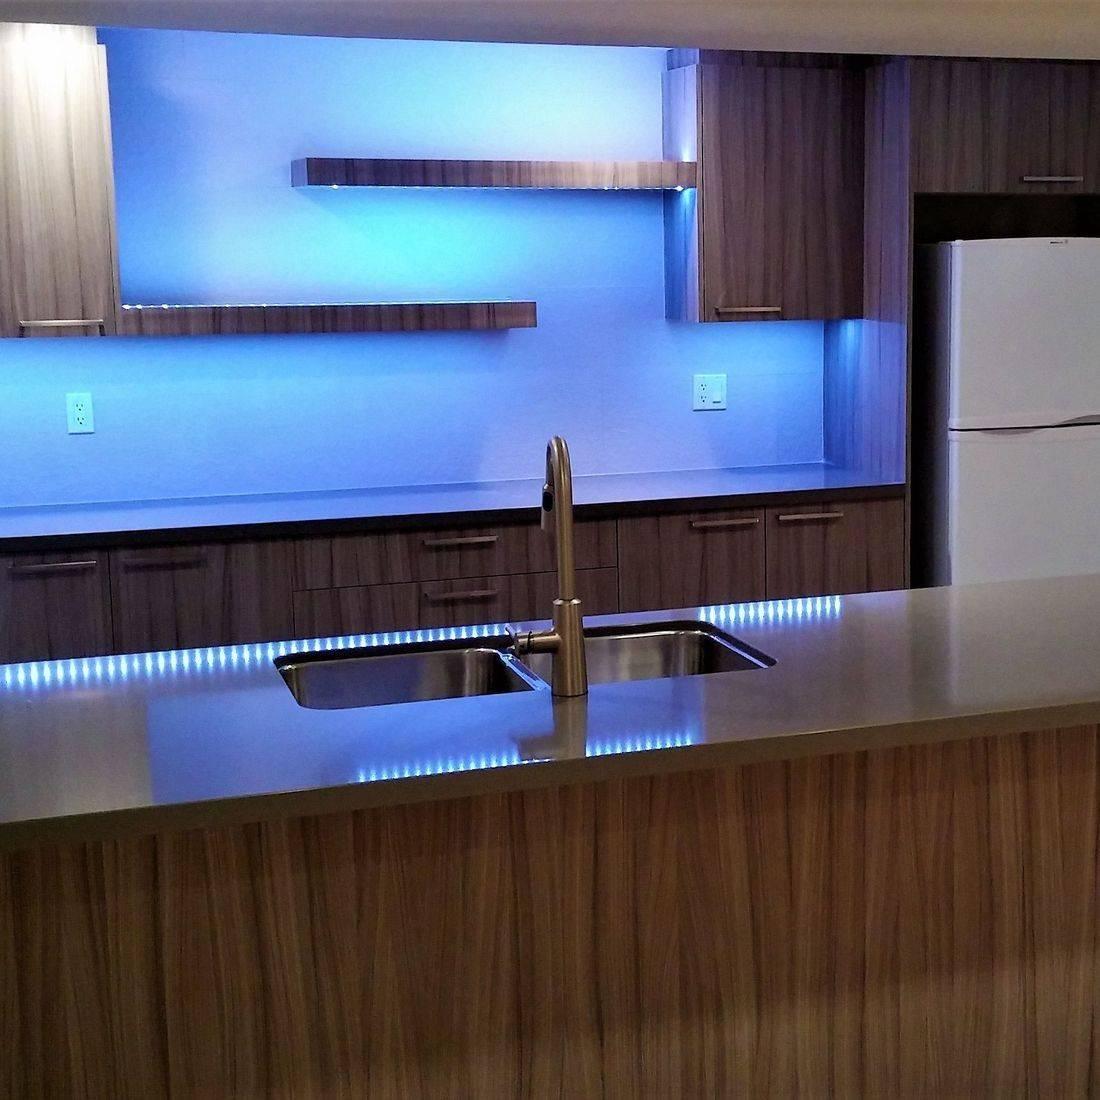 Sibra Kitchens Markham Toronto cabinets basement bar